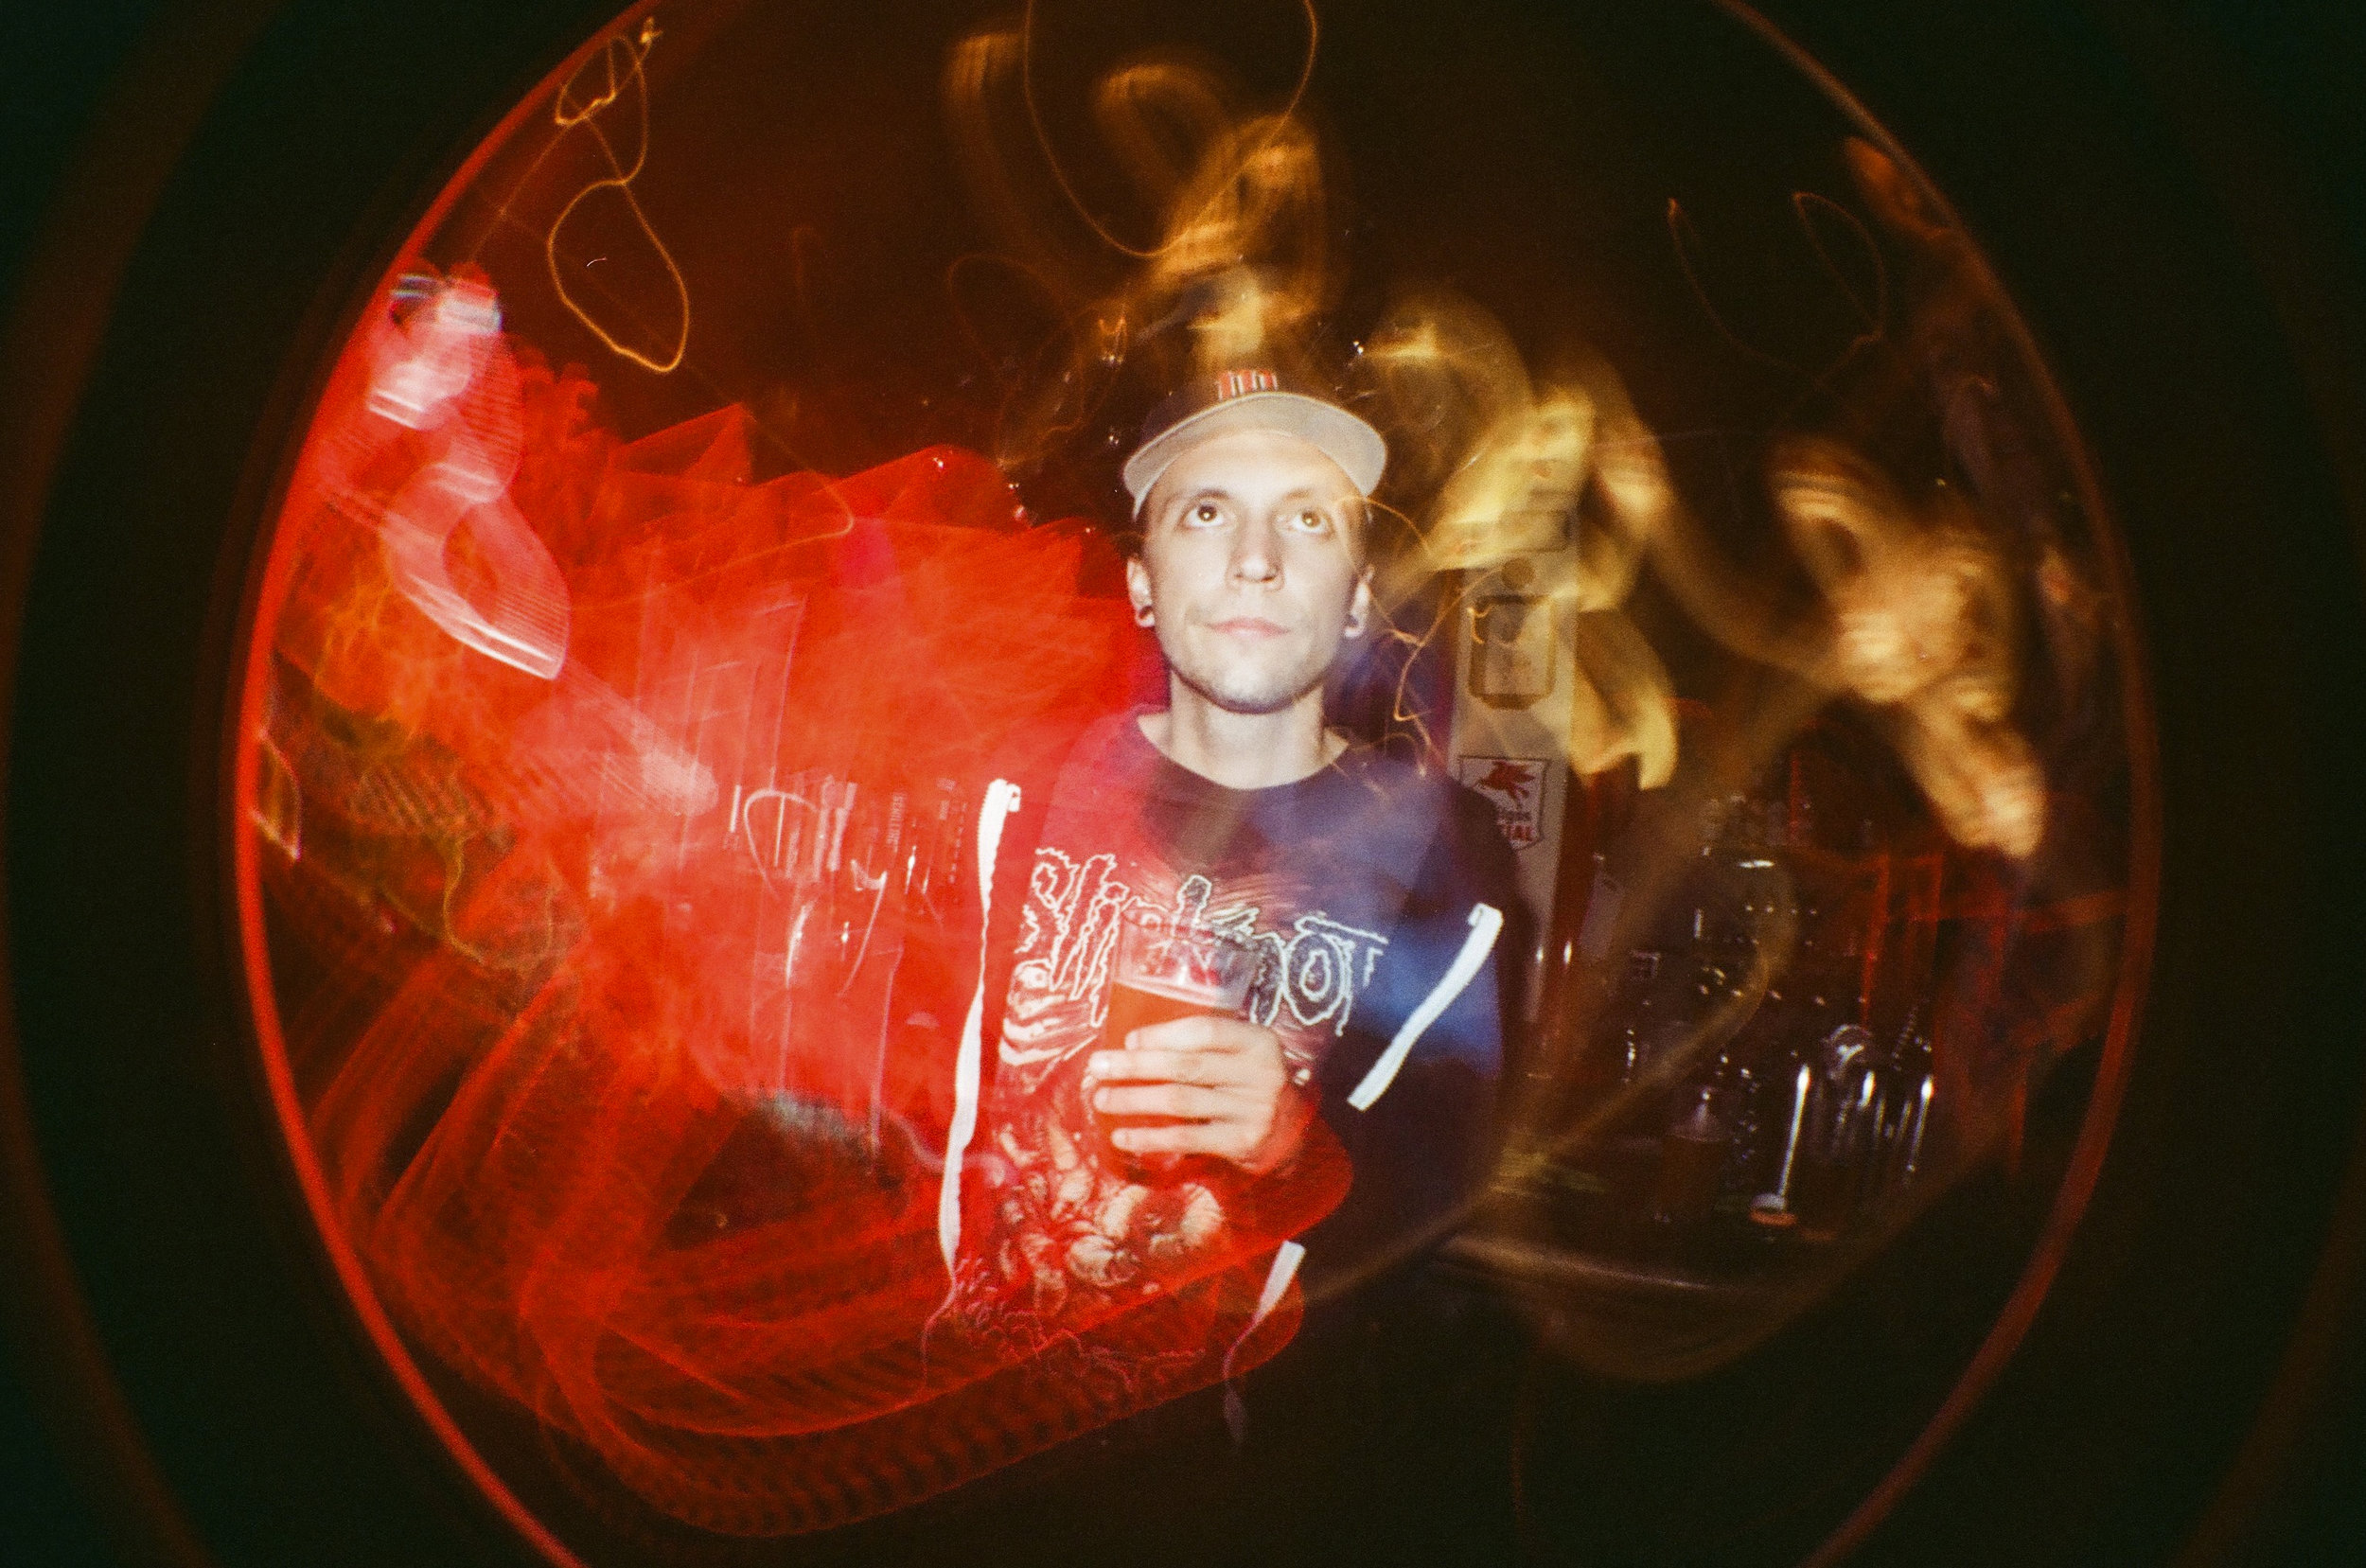 Death Metal Joe - Shot with Lomography Fisheye One - 35mm Film - Portland, OR